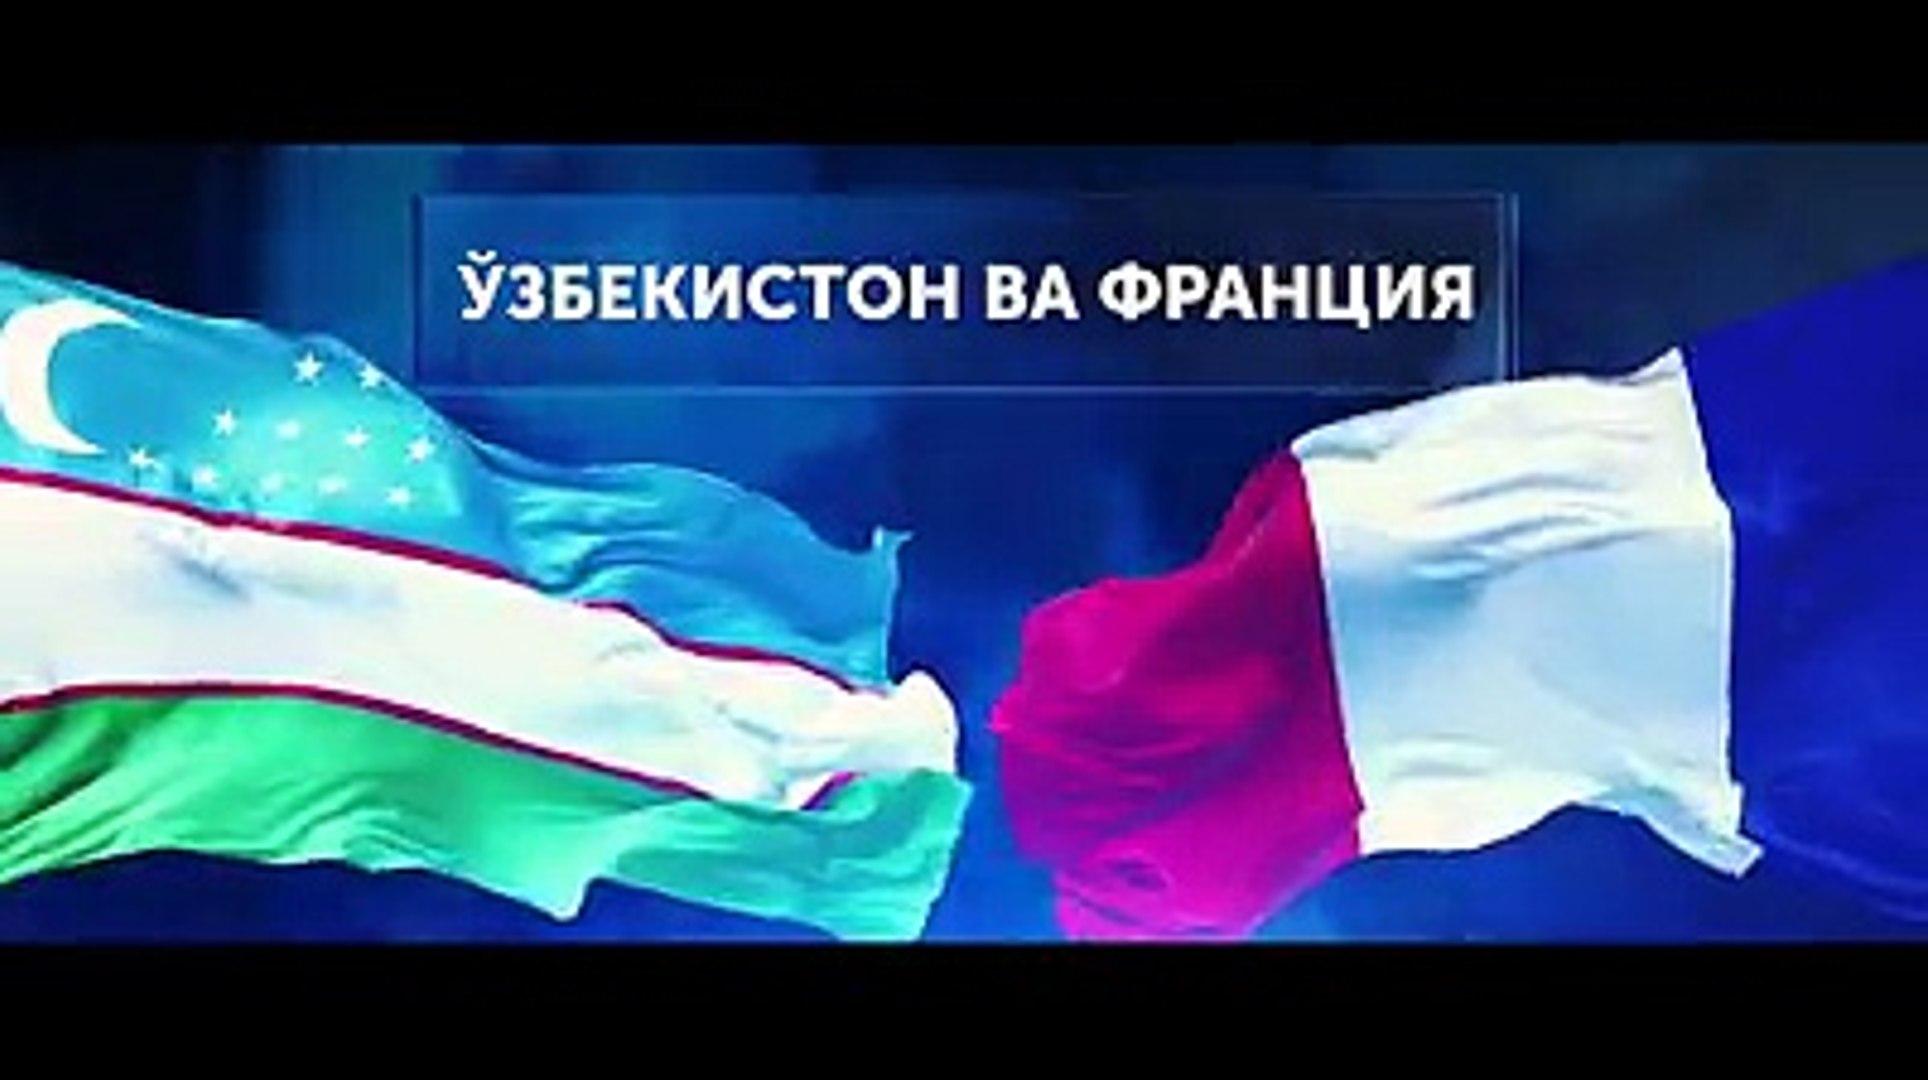 #UZBFRA2018Ўзбекистон-Франция: ҳамкорликнинг янги босқичи.—Узбекистан-Франция: новый этап сотрудничества.